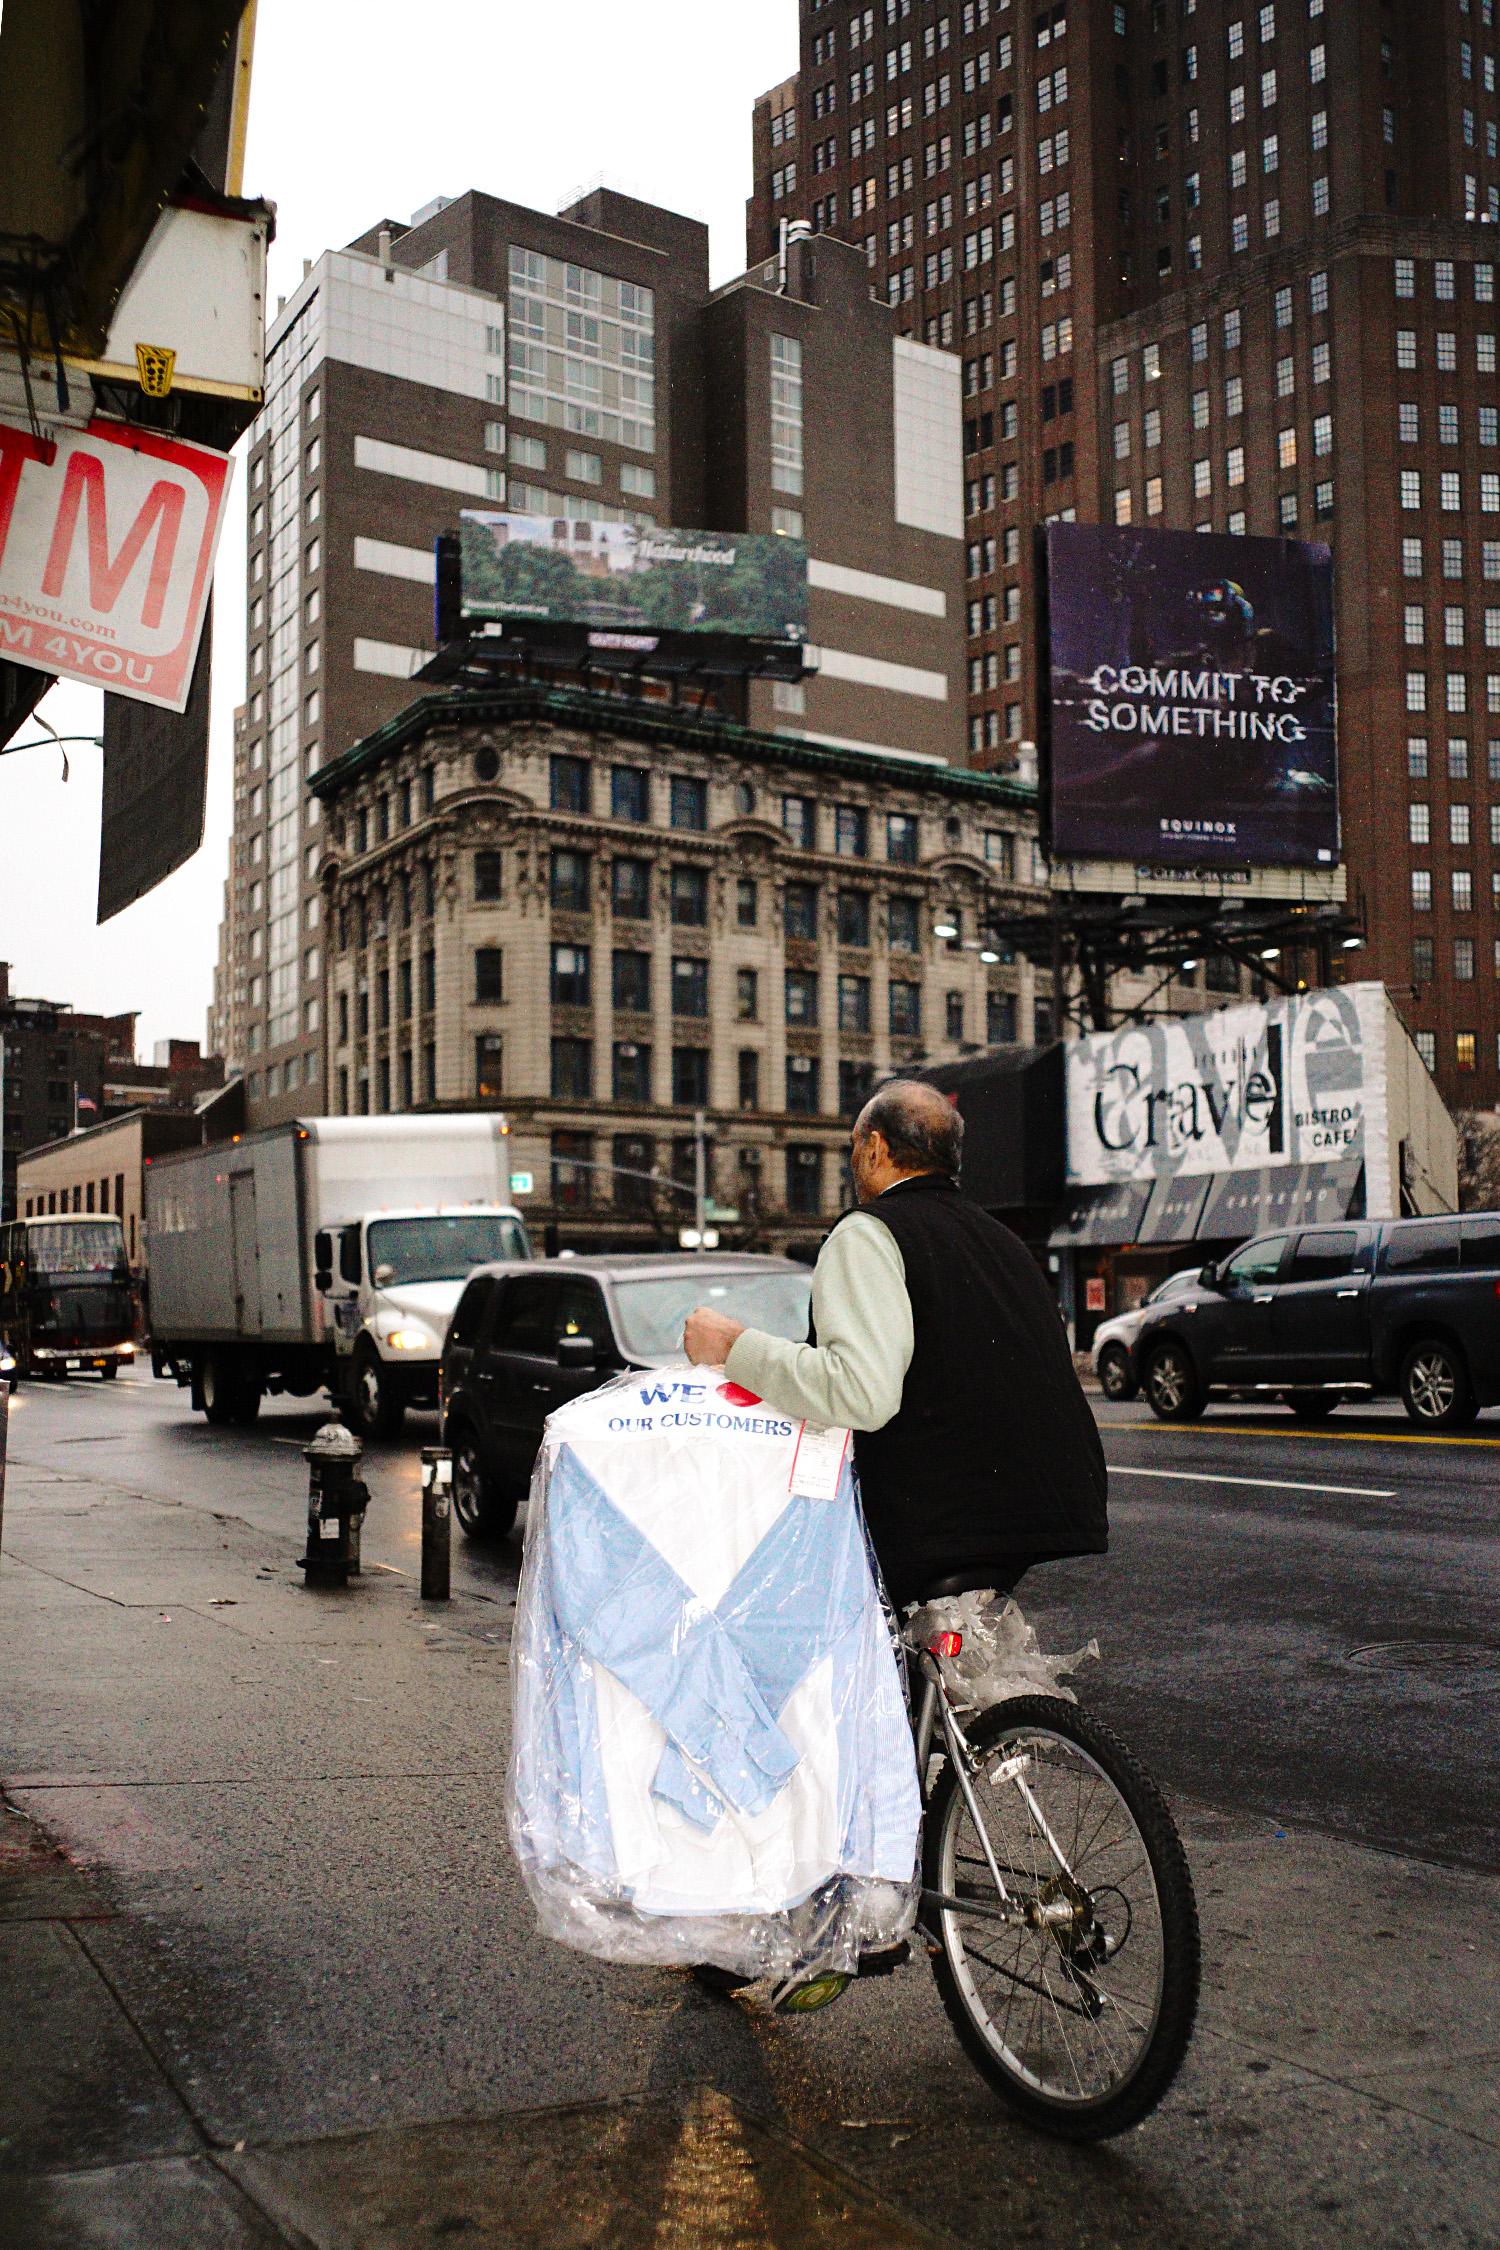 Man on bike, NYC, 2017